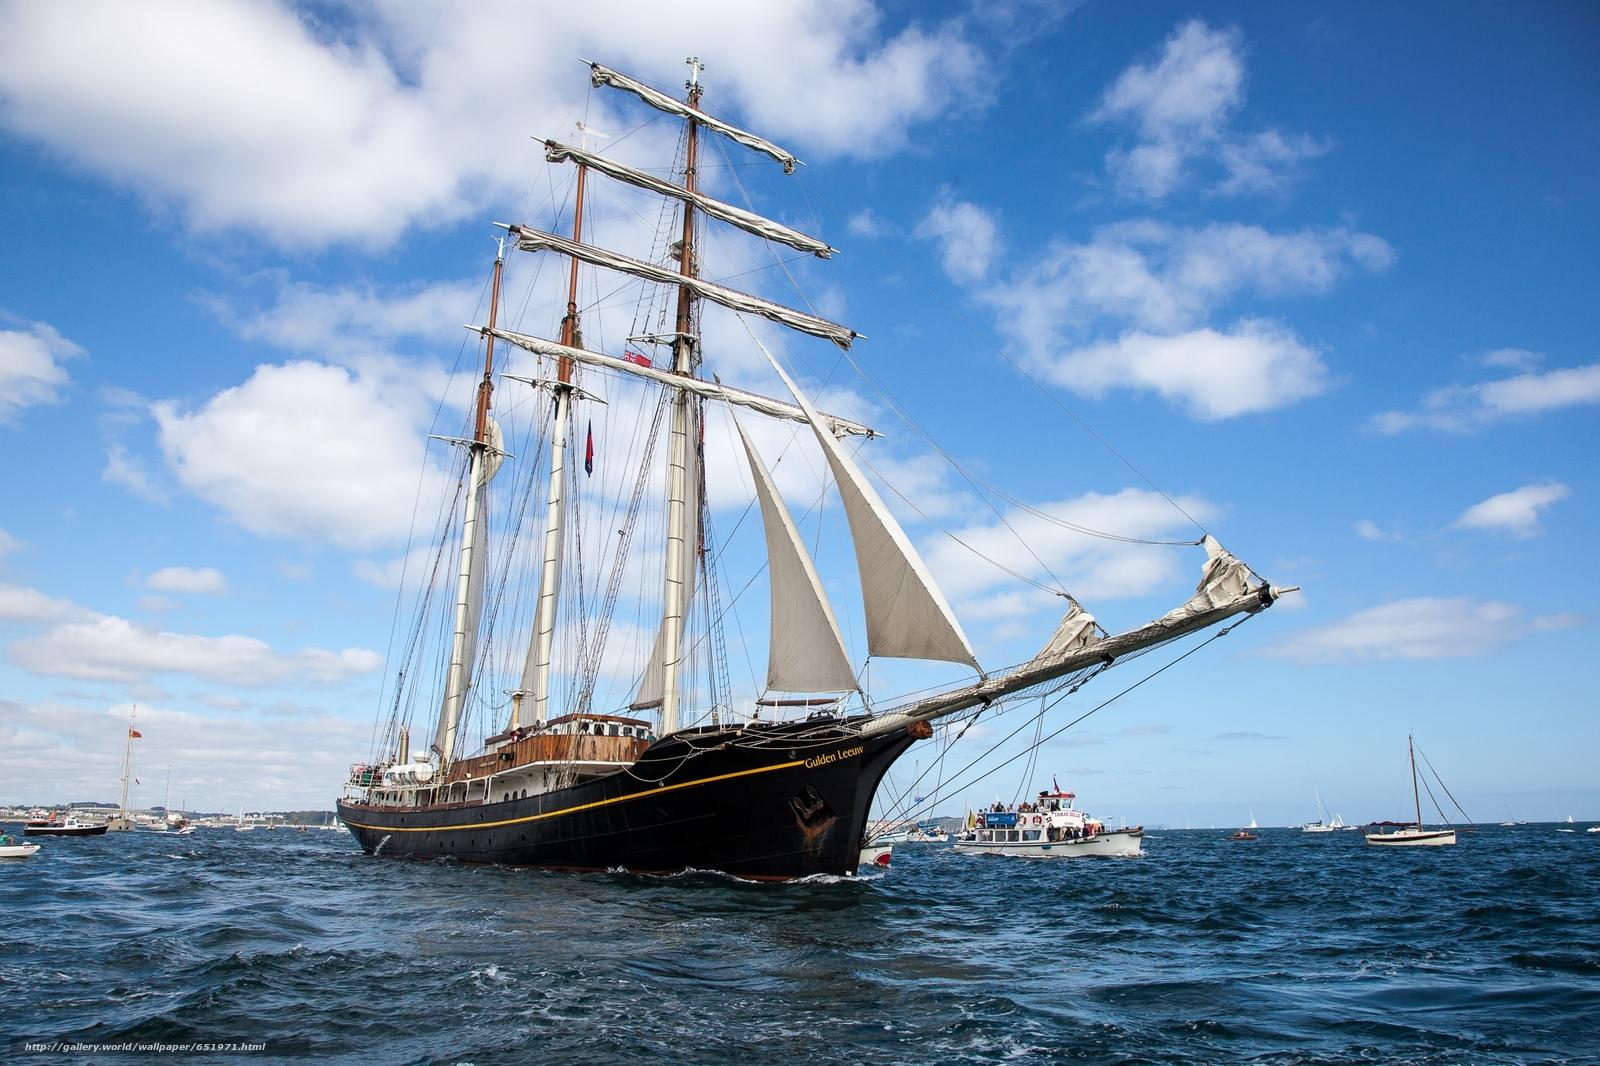 Gulden Leeuw, sailfish, ship, Netherlands